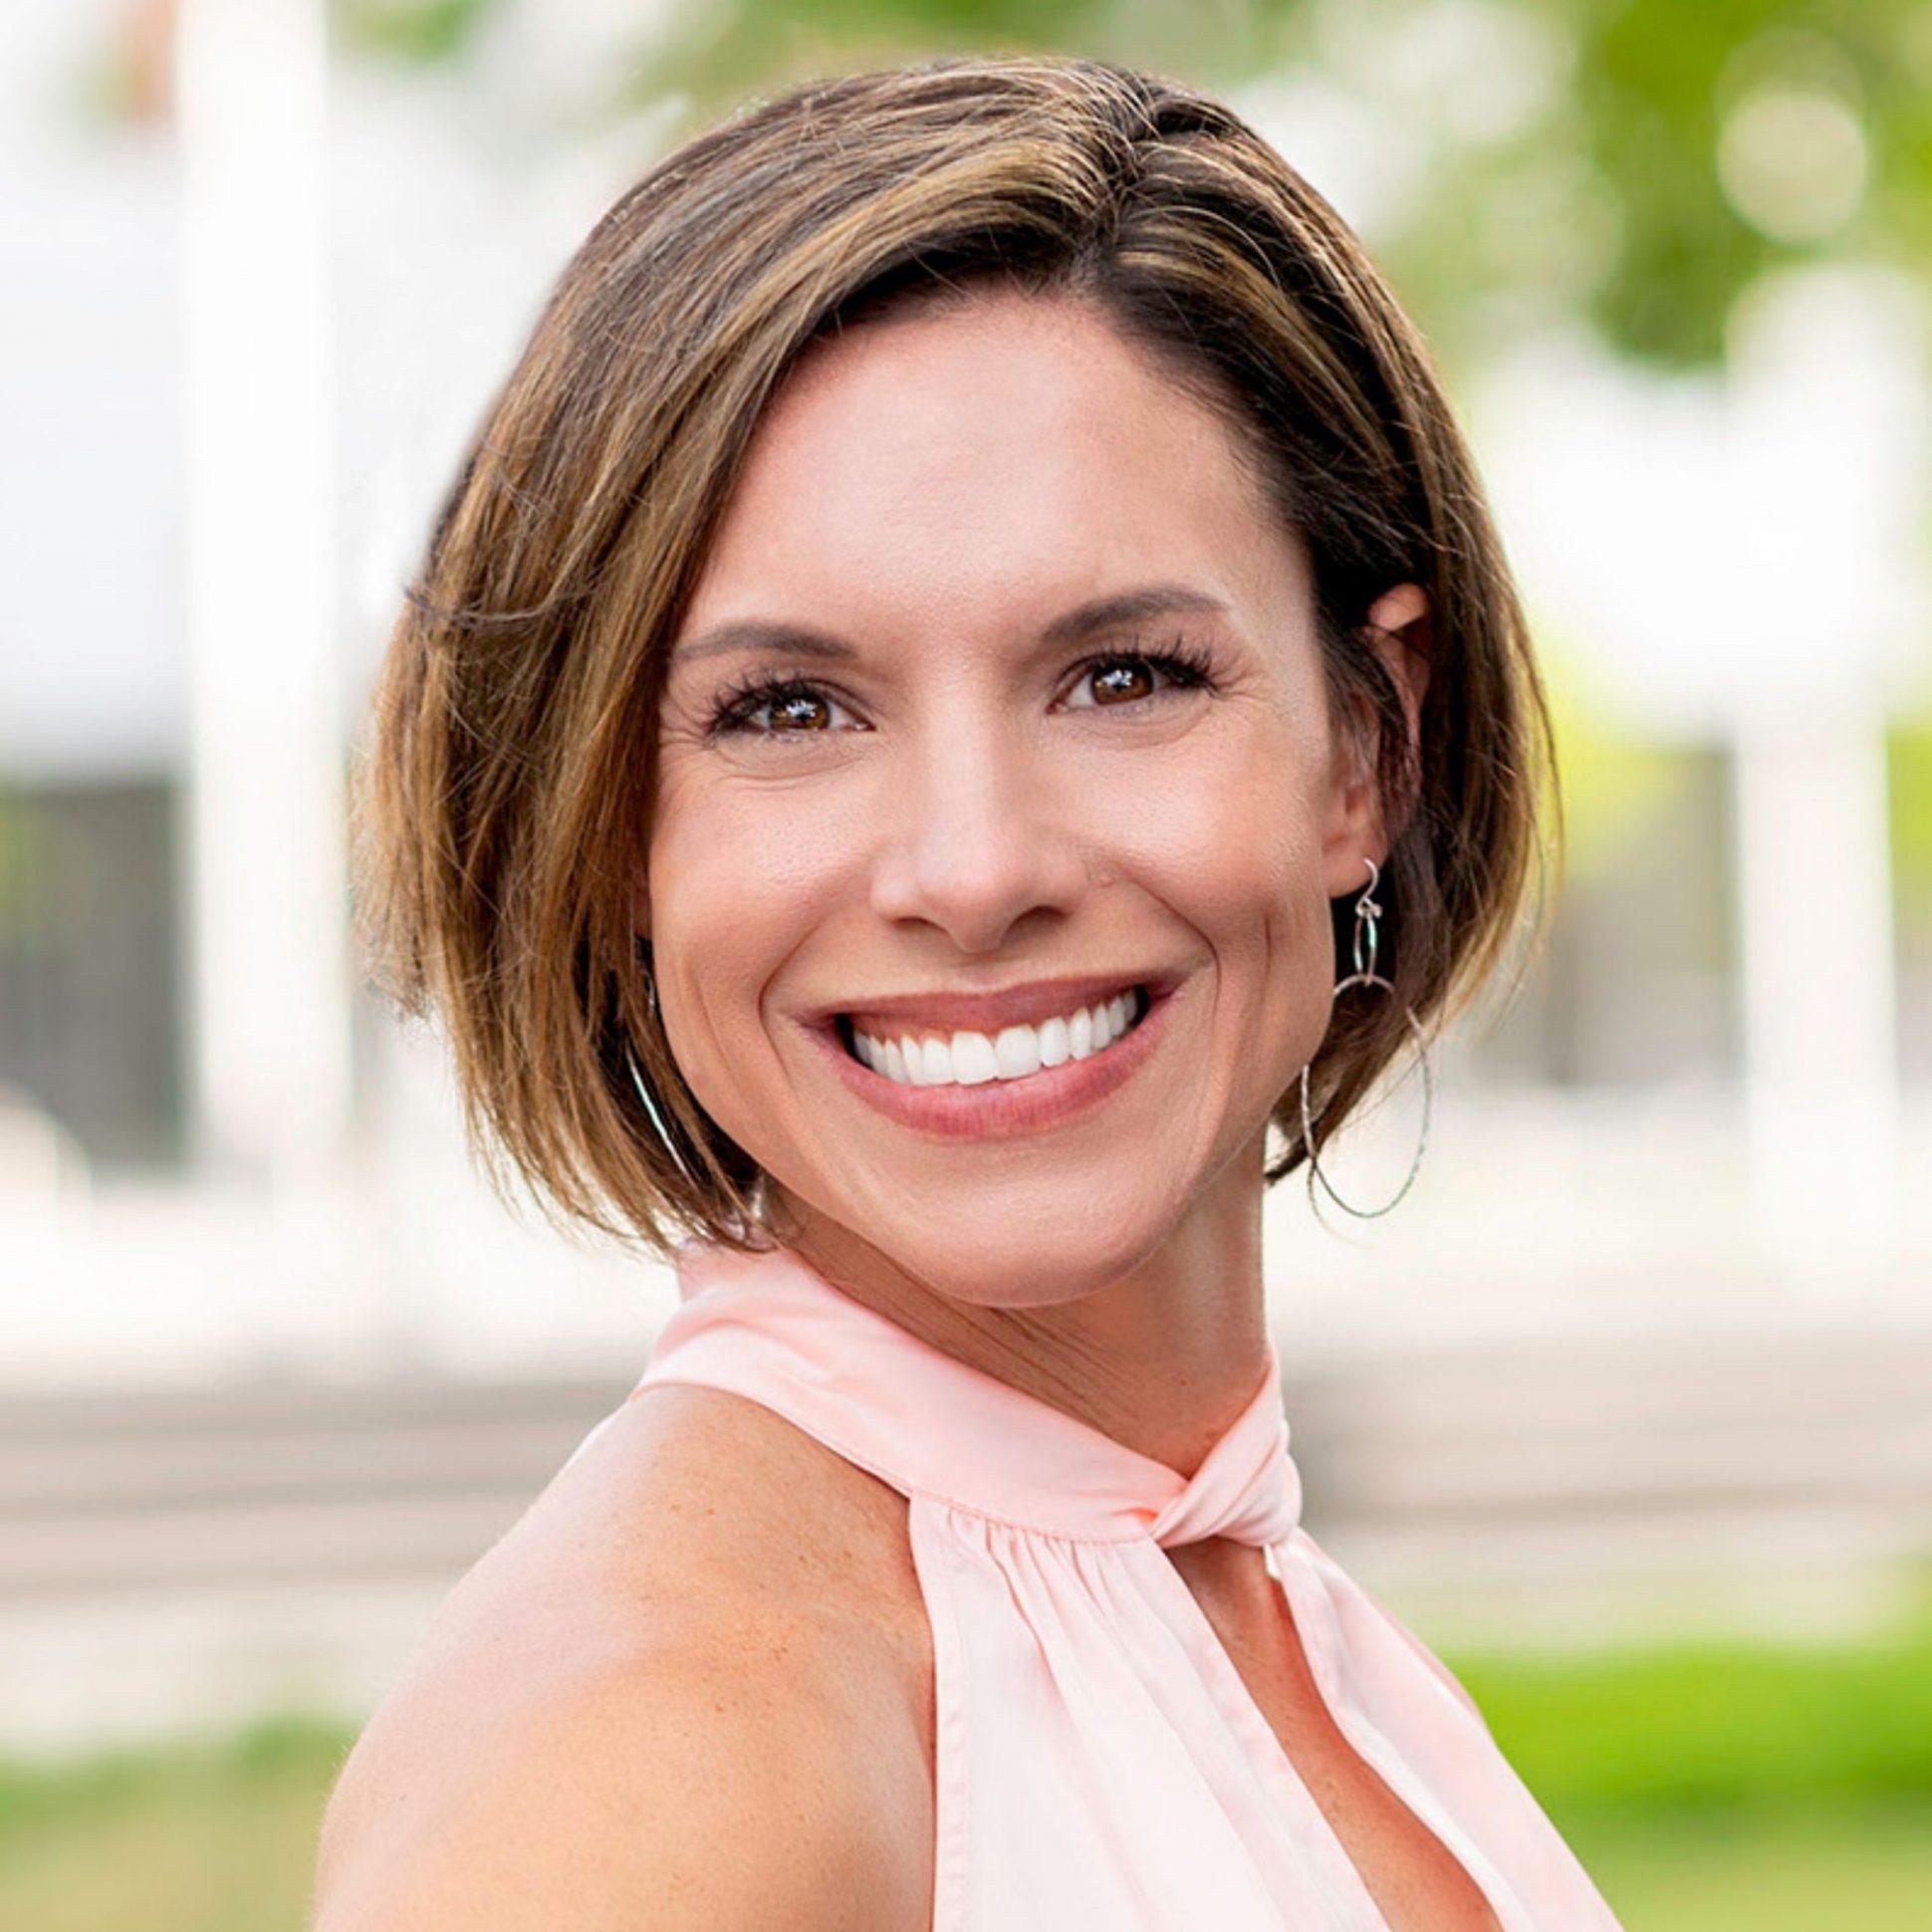 Jennifer McChristian